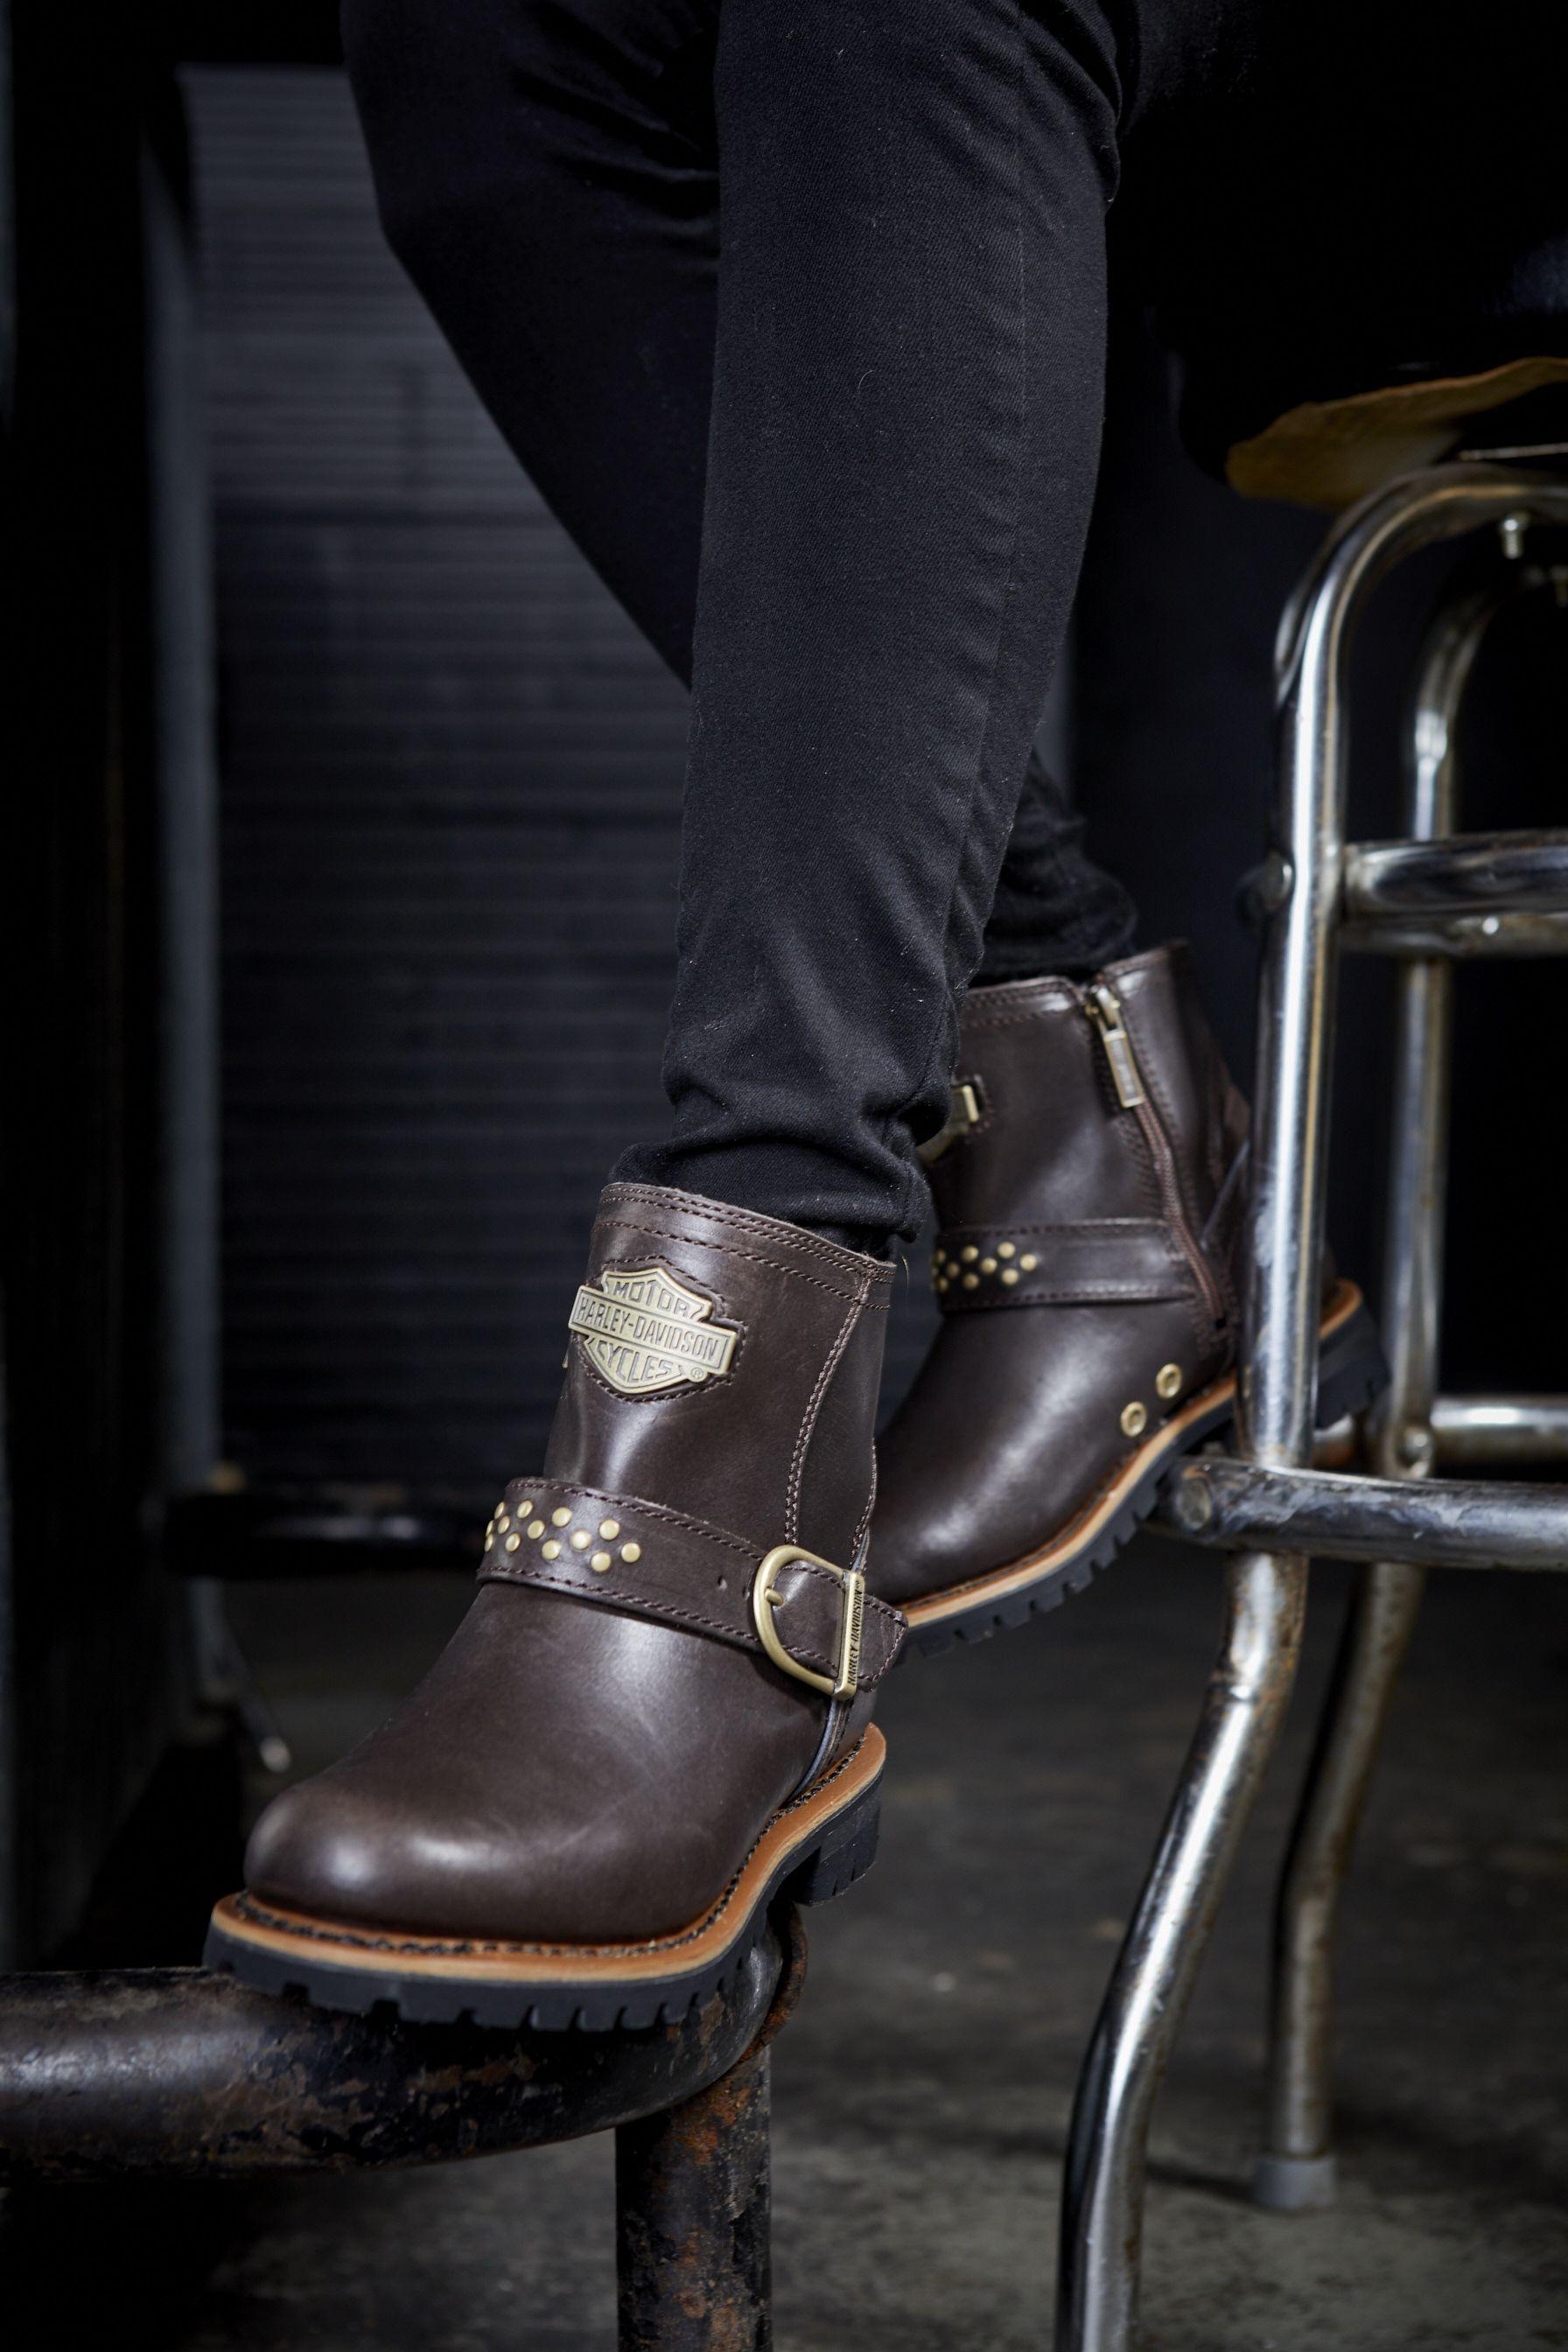 f6e047b2aa188 Women's Brantley Boot | Women's Dealer Exclusives | Harley davidson ...